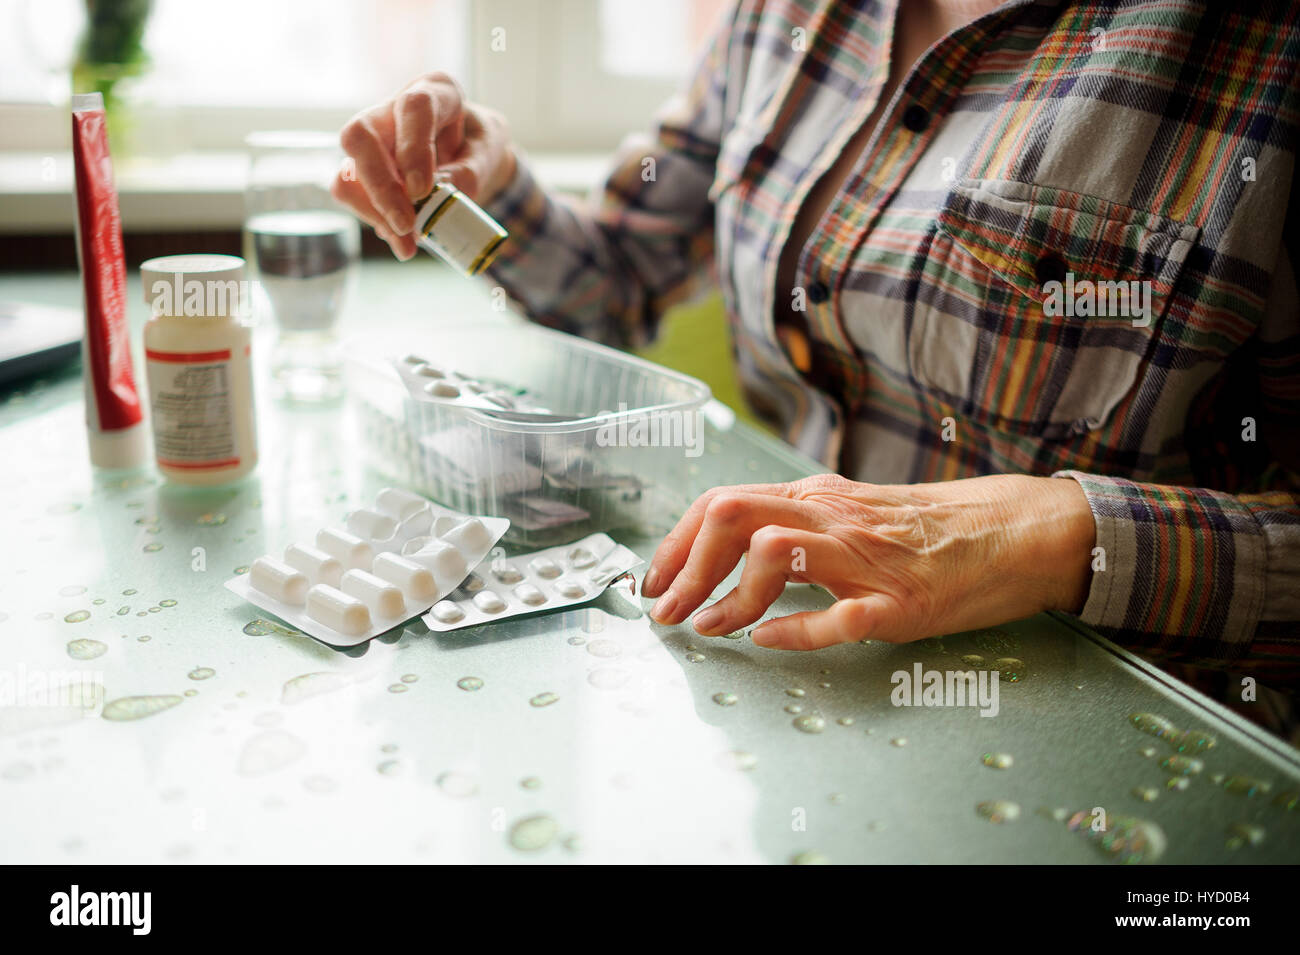 The woman having rheumatoid arthritis takes medicine. Hands are deformed. - Stock Image